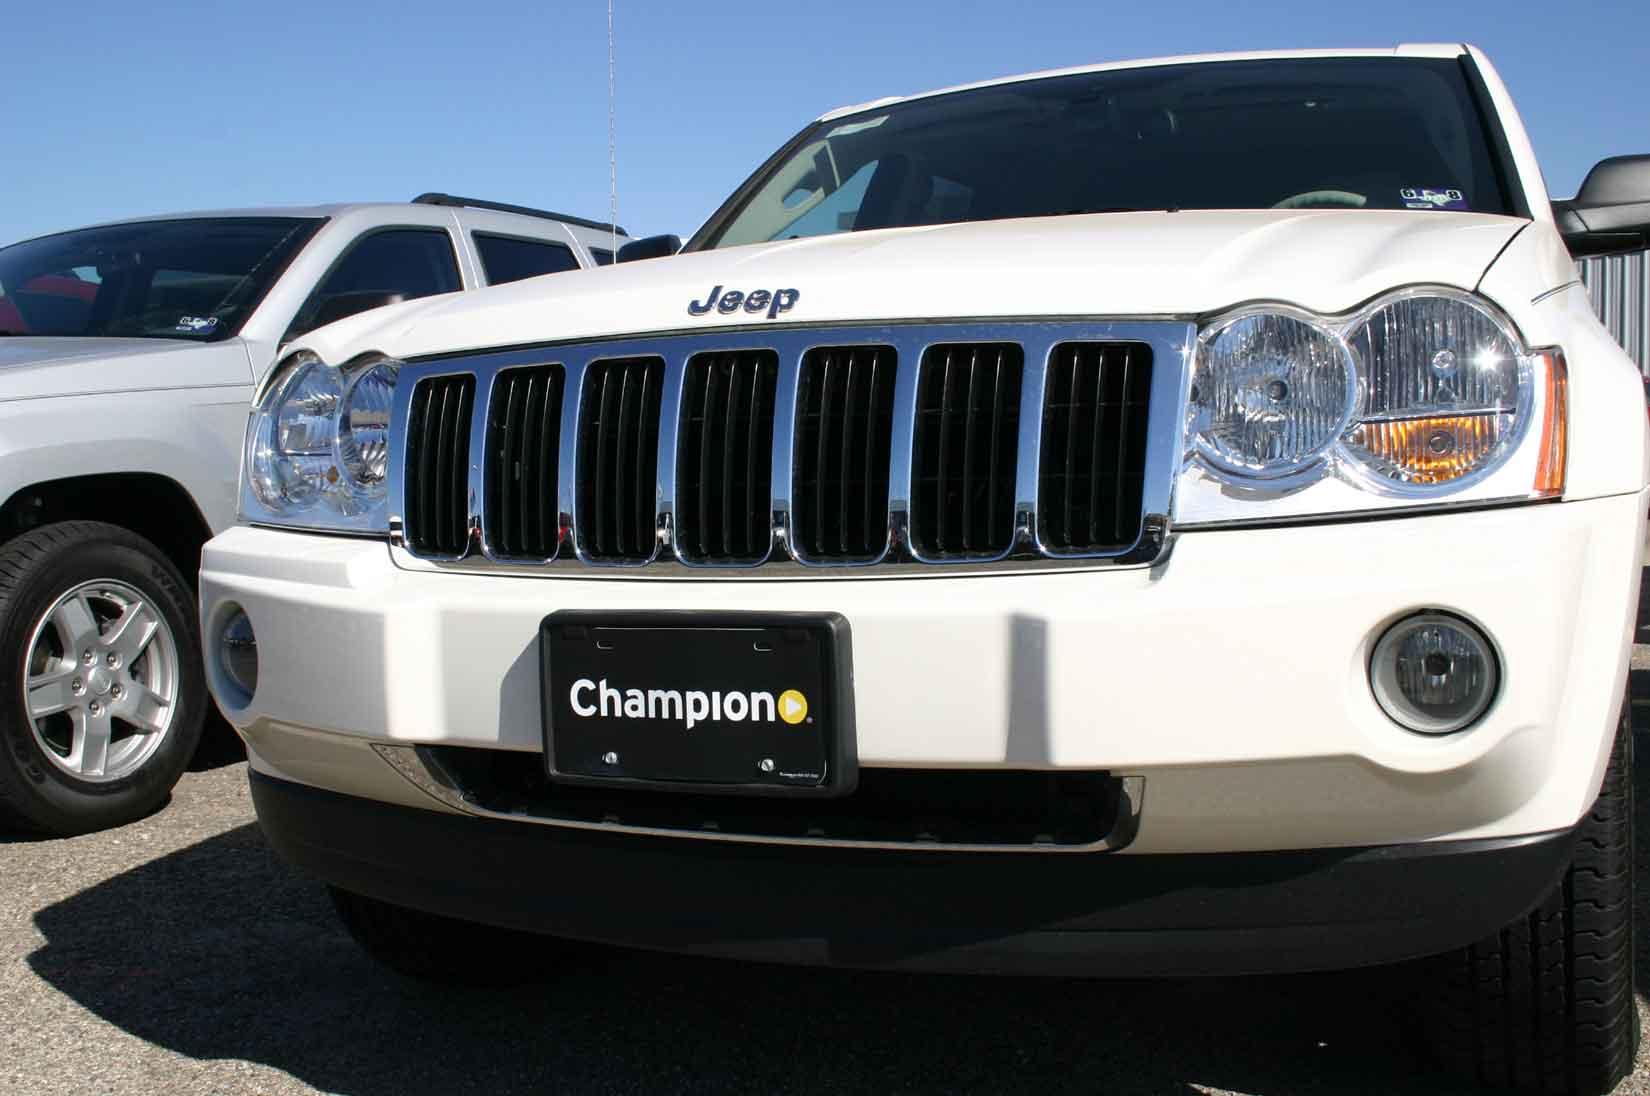 Jeep Grand Cherokee Chrome Grille Insert Overlay Trim